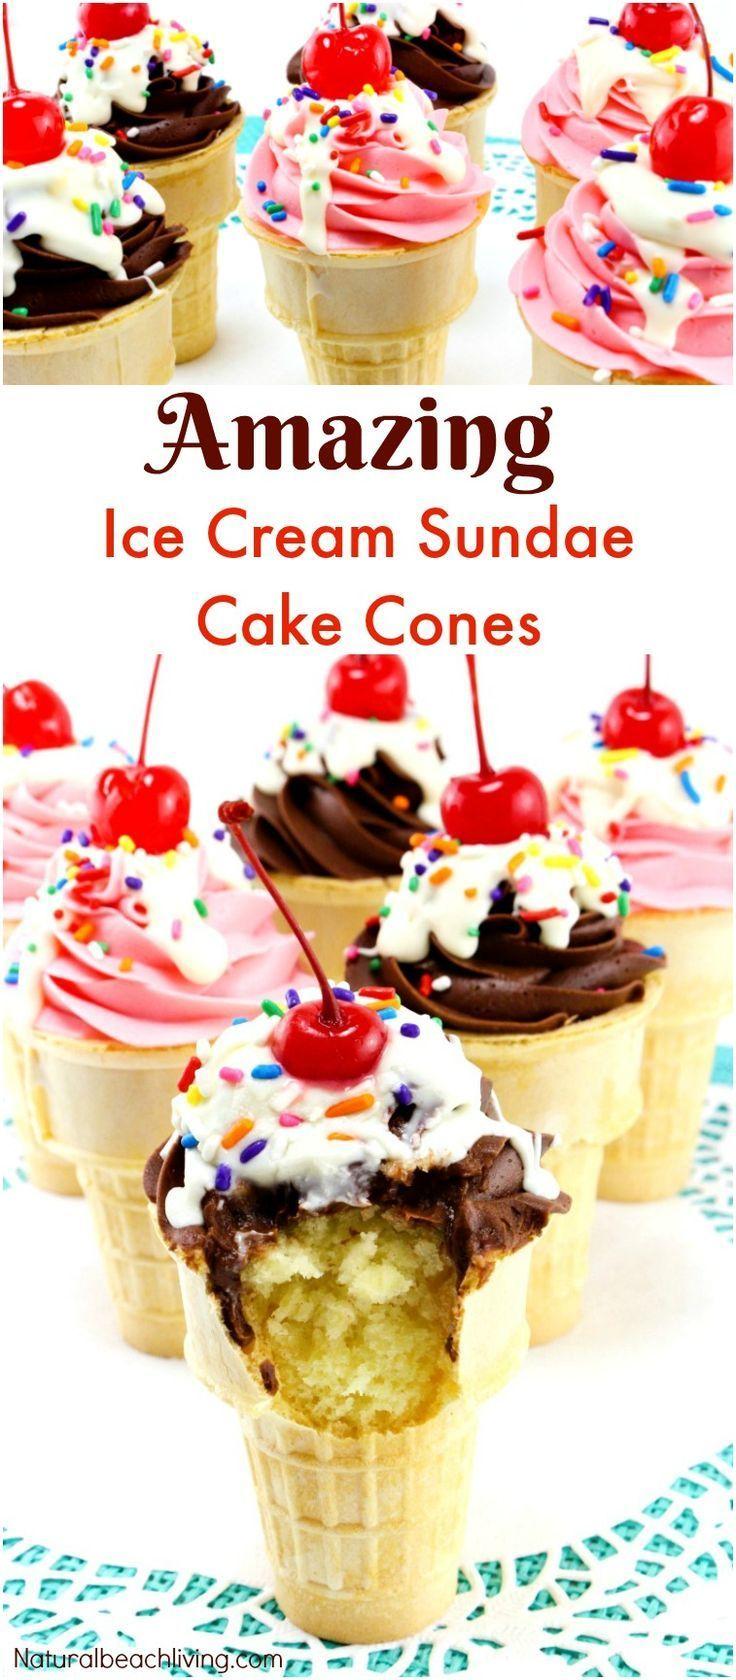 How To Make Amazing Sundae Ice Cream Cake Cones Make Delicious